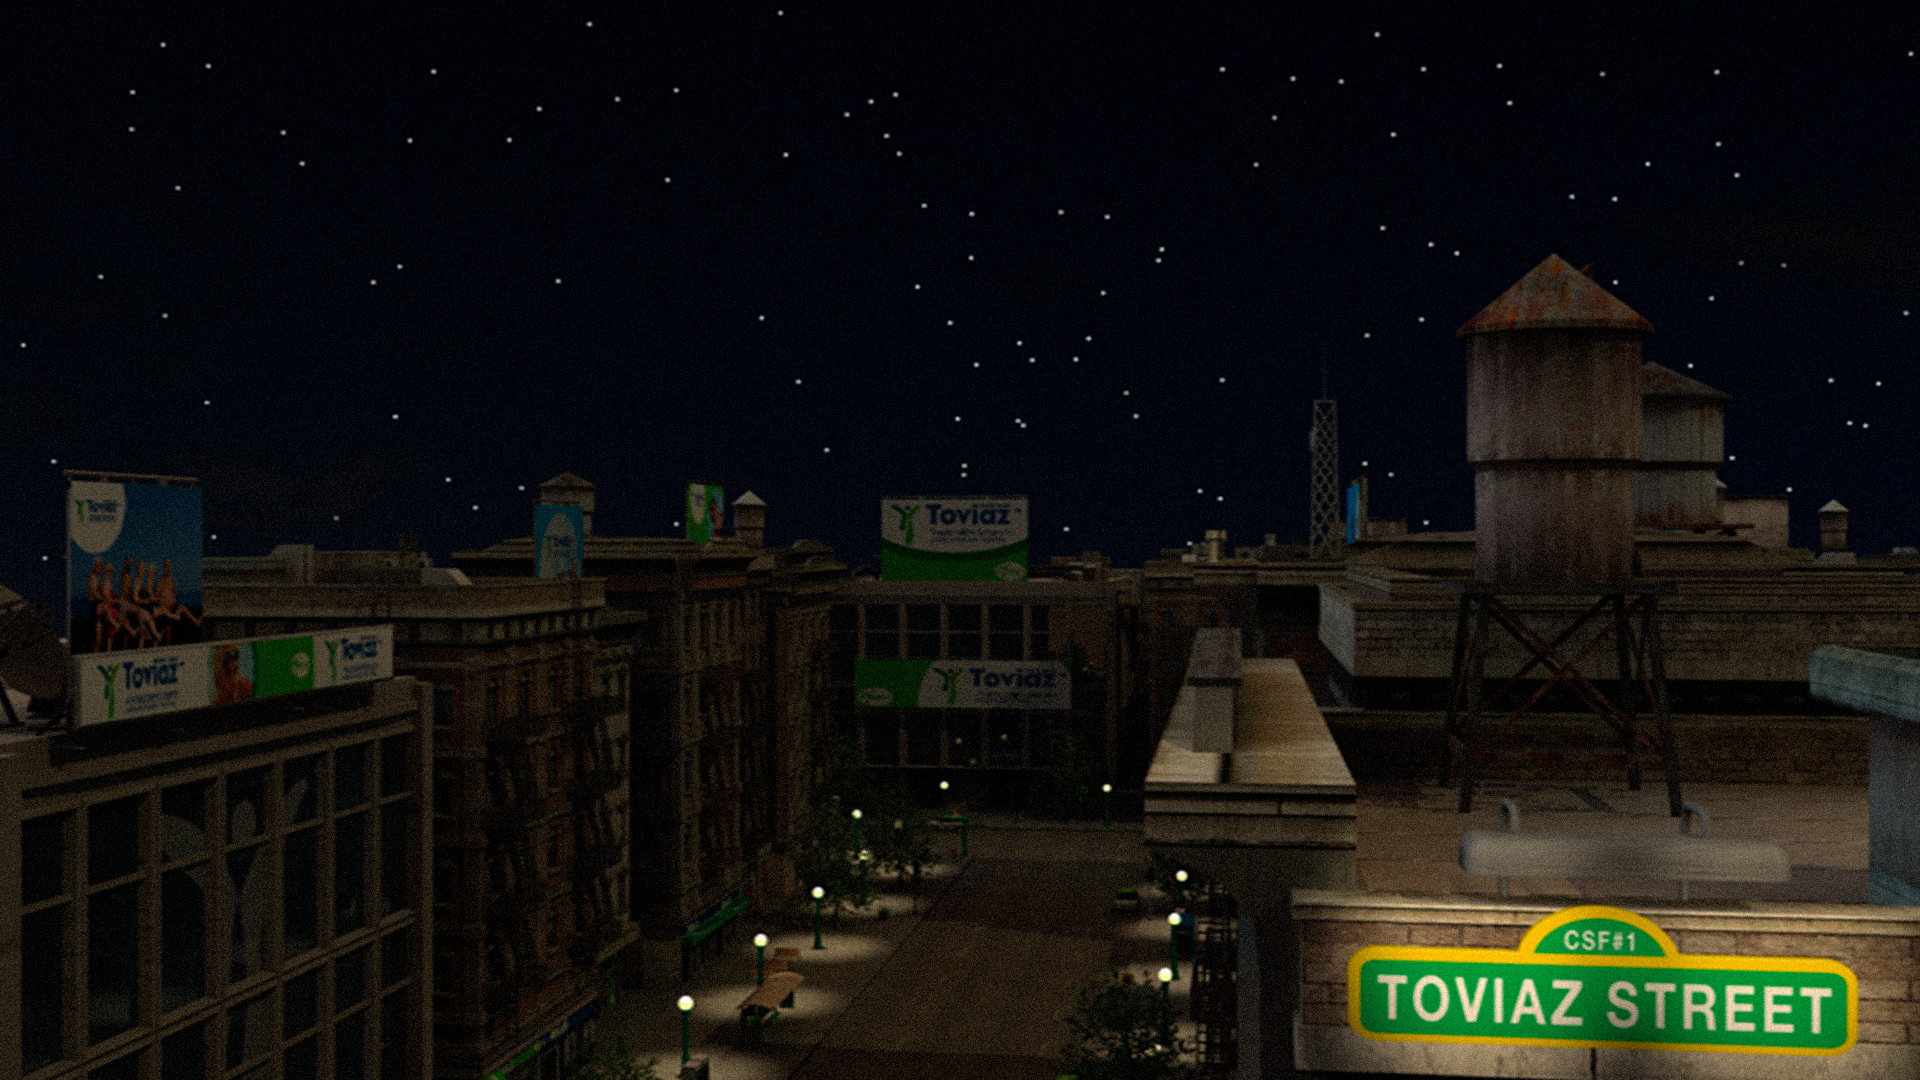 toviaz_street_pfizer1